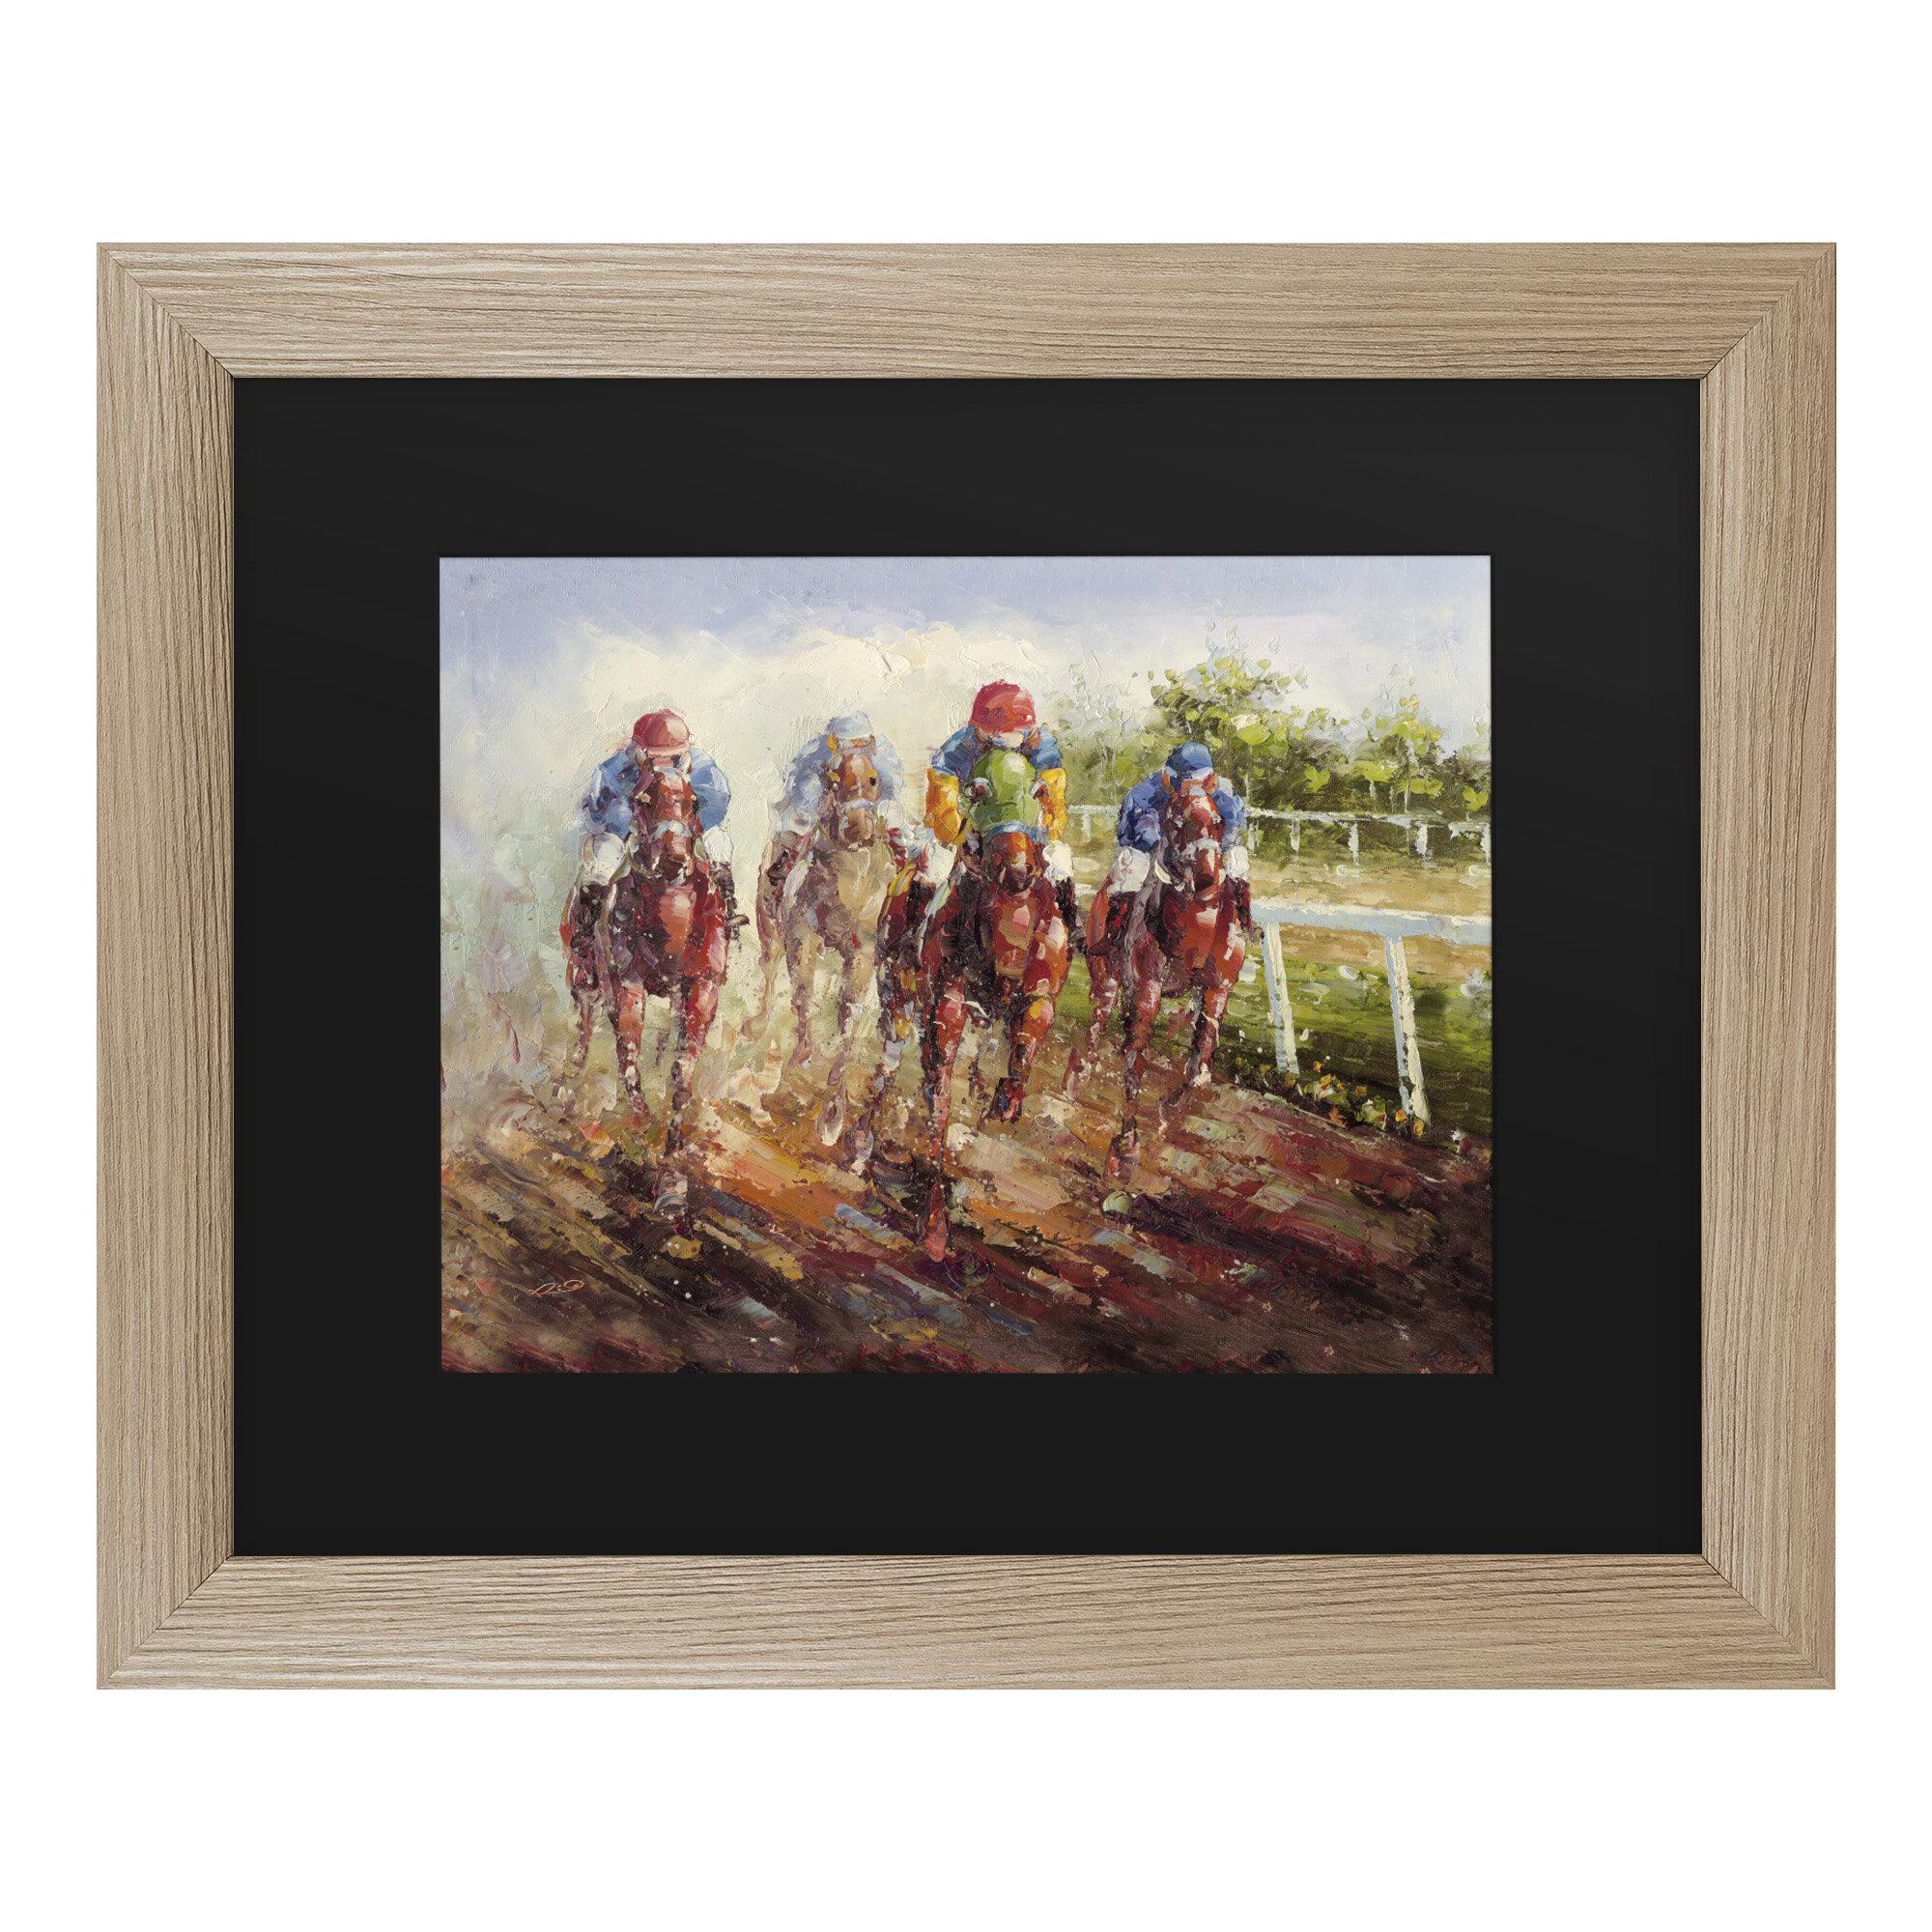 Framed Acrylic Painting Print